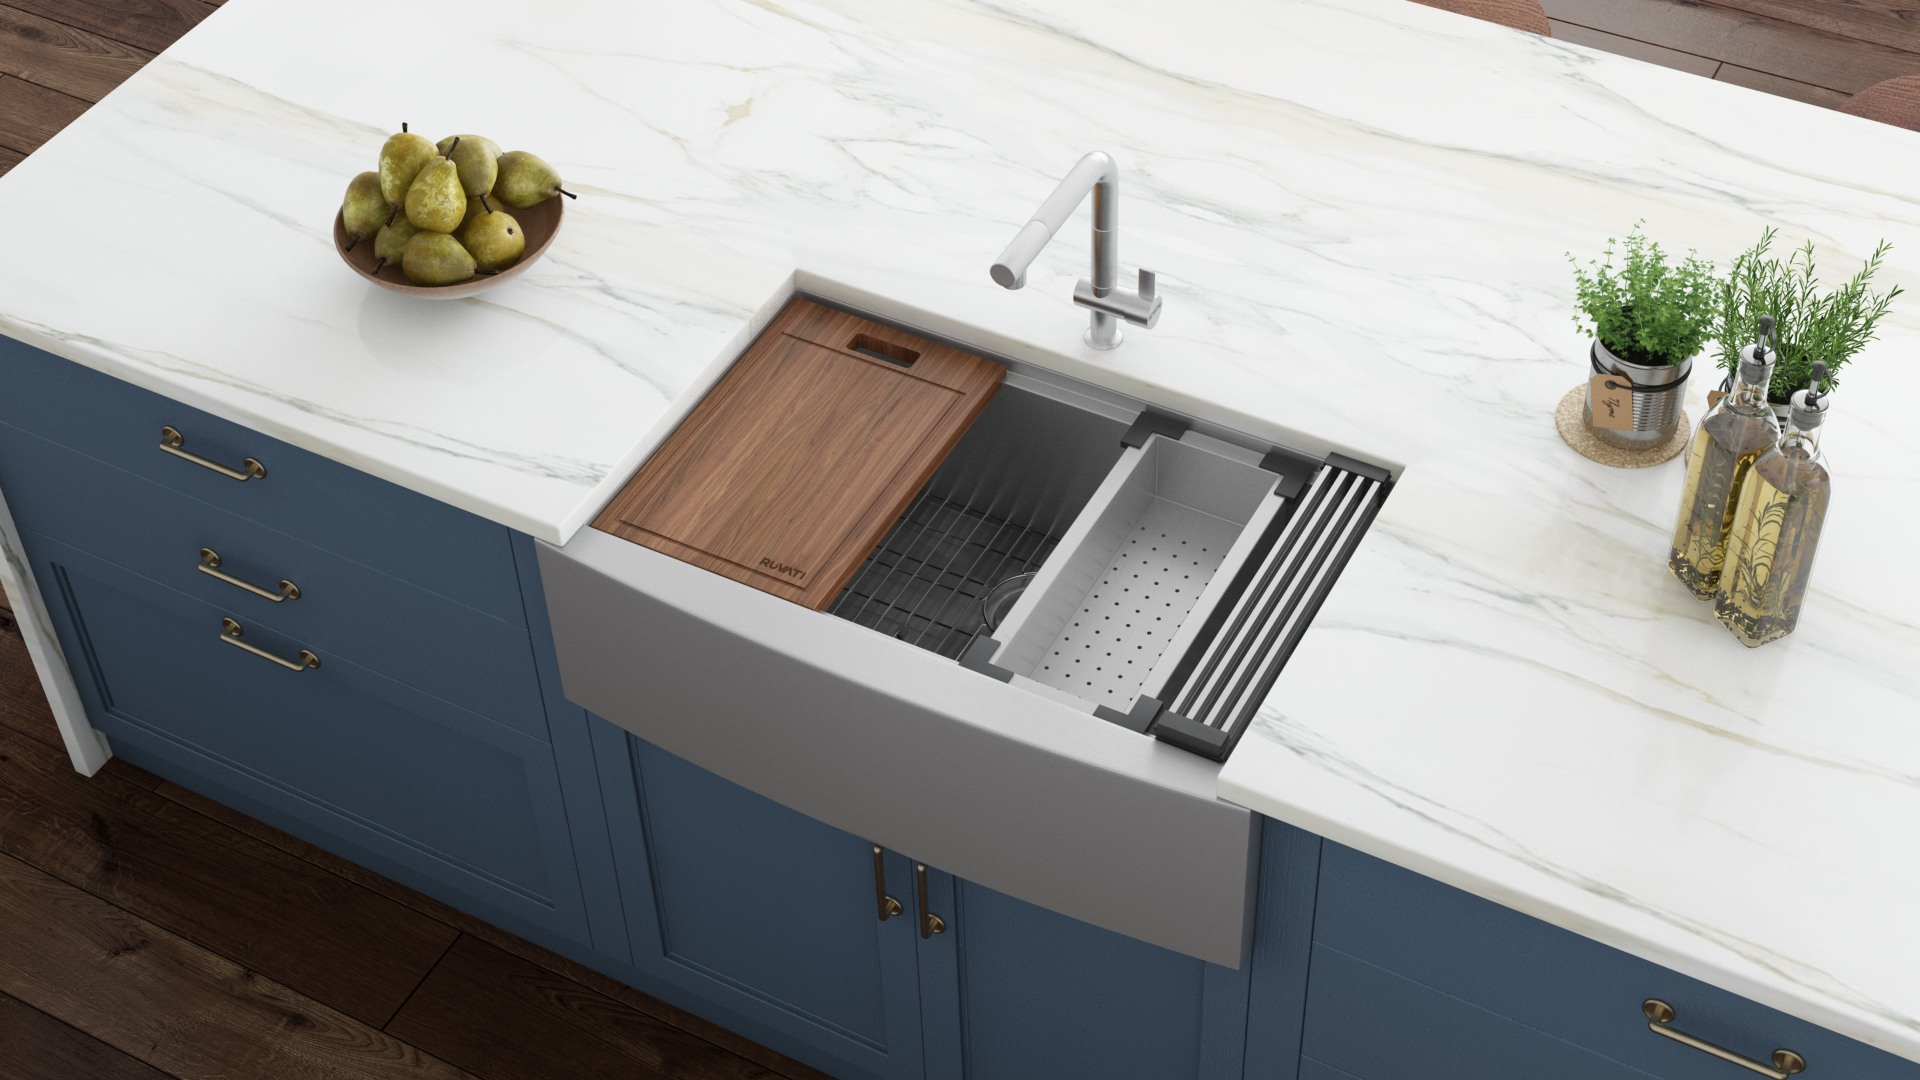 ruvati verona farmhouse apron front 33 in x 22 in stainless steel single bowl workstation kitchen sink